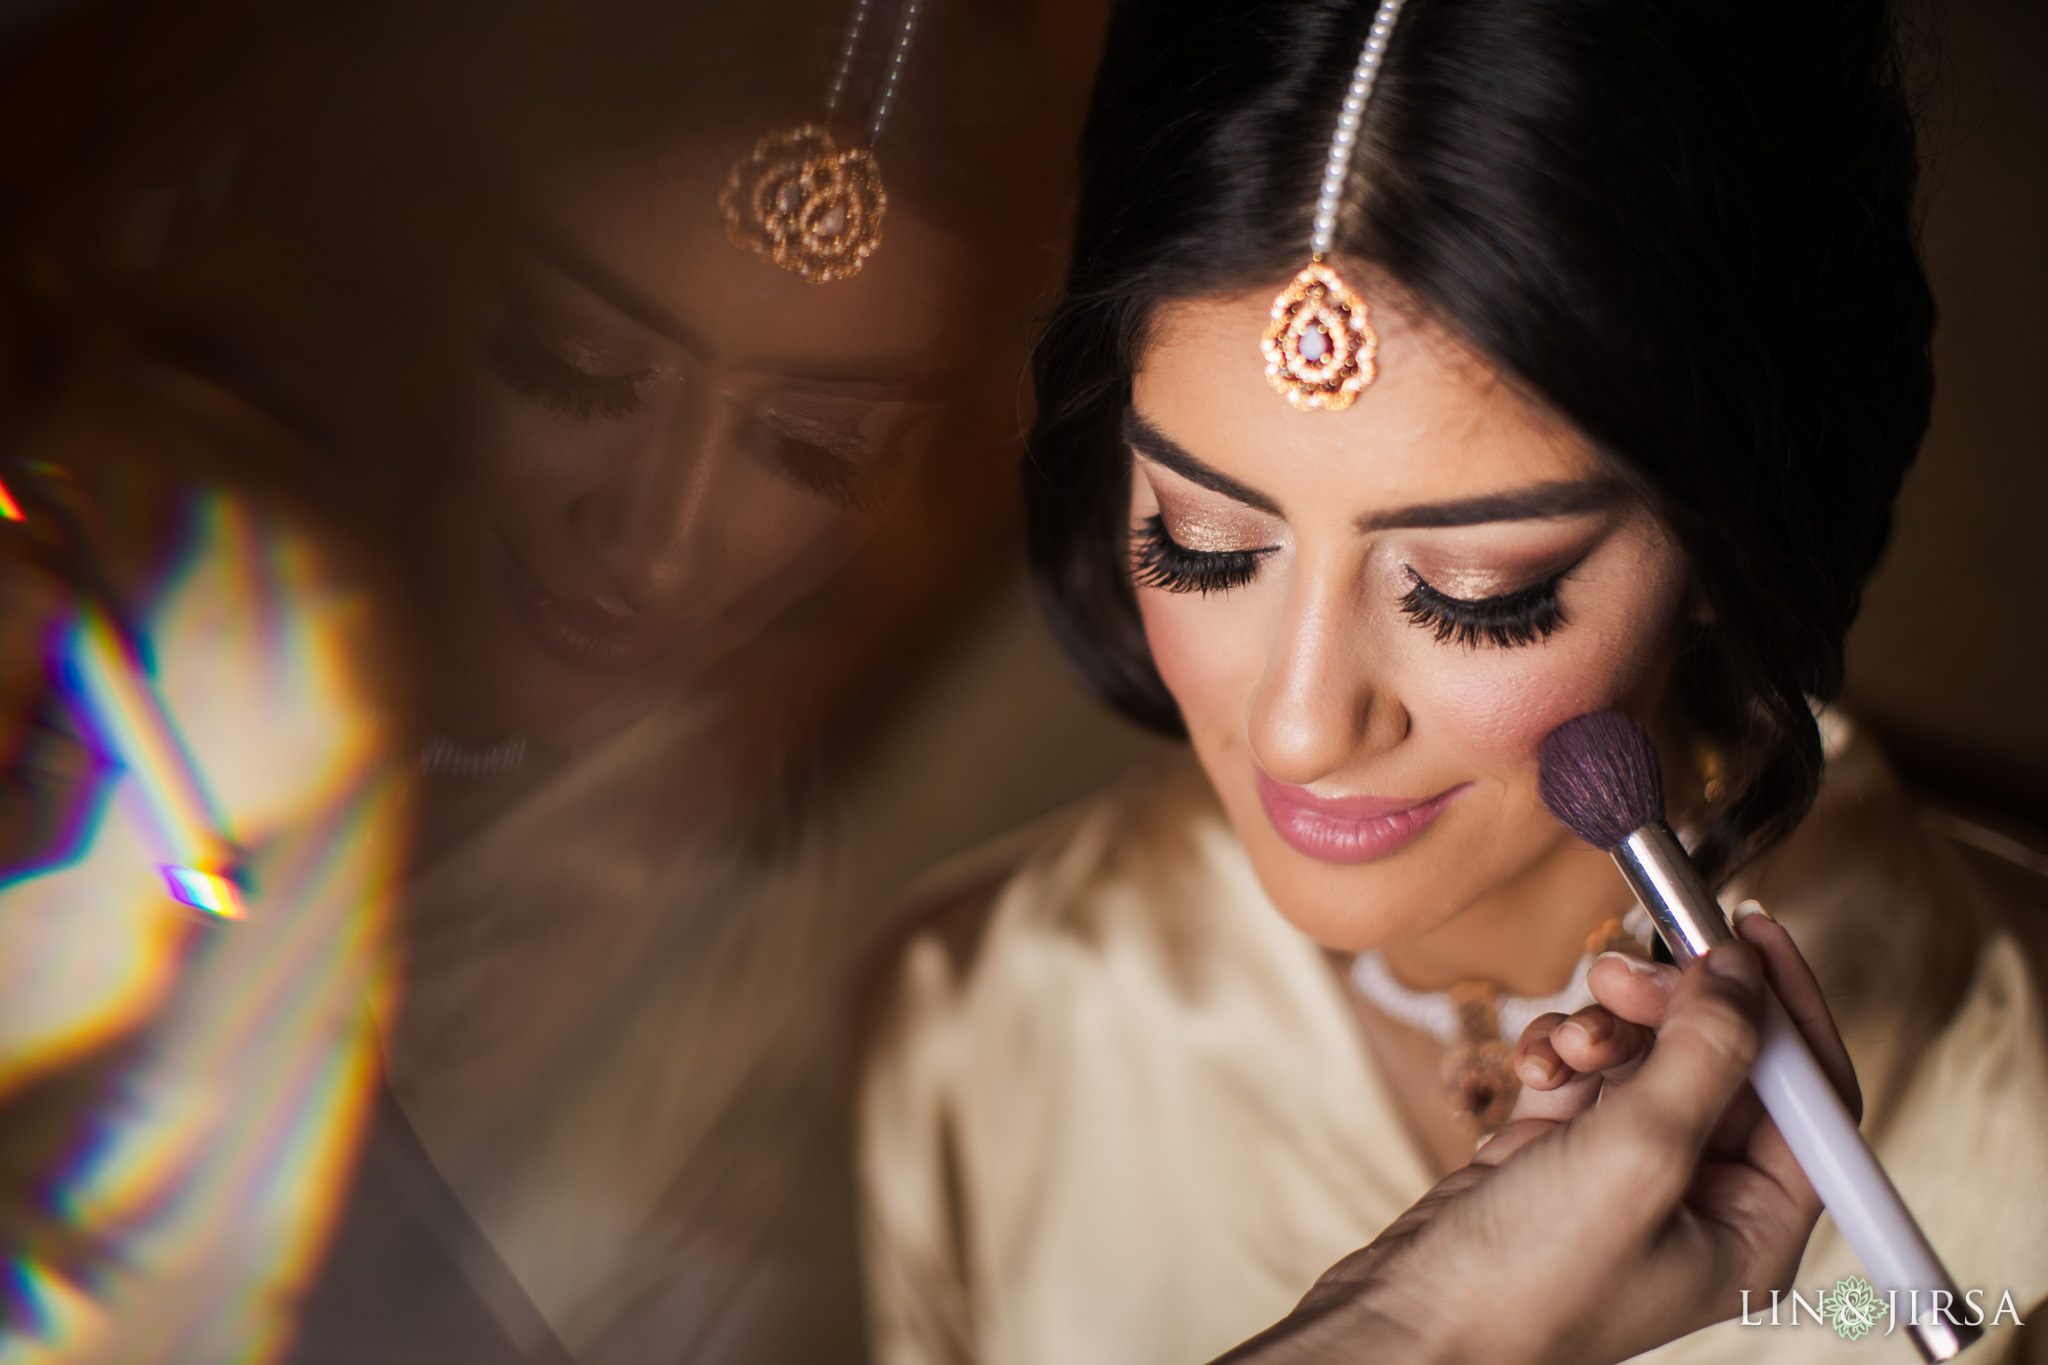 zcl four seasons westlake village muslim bride wedding photography